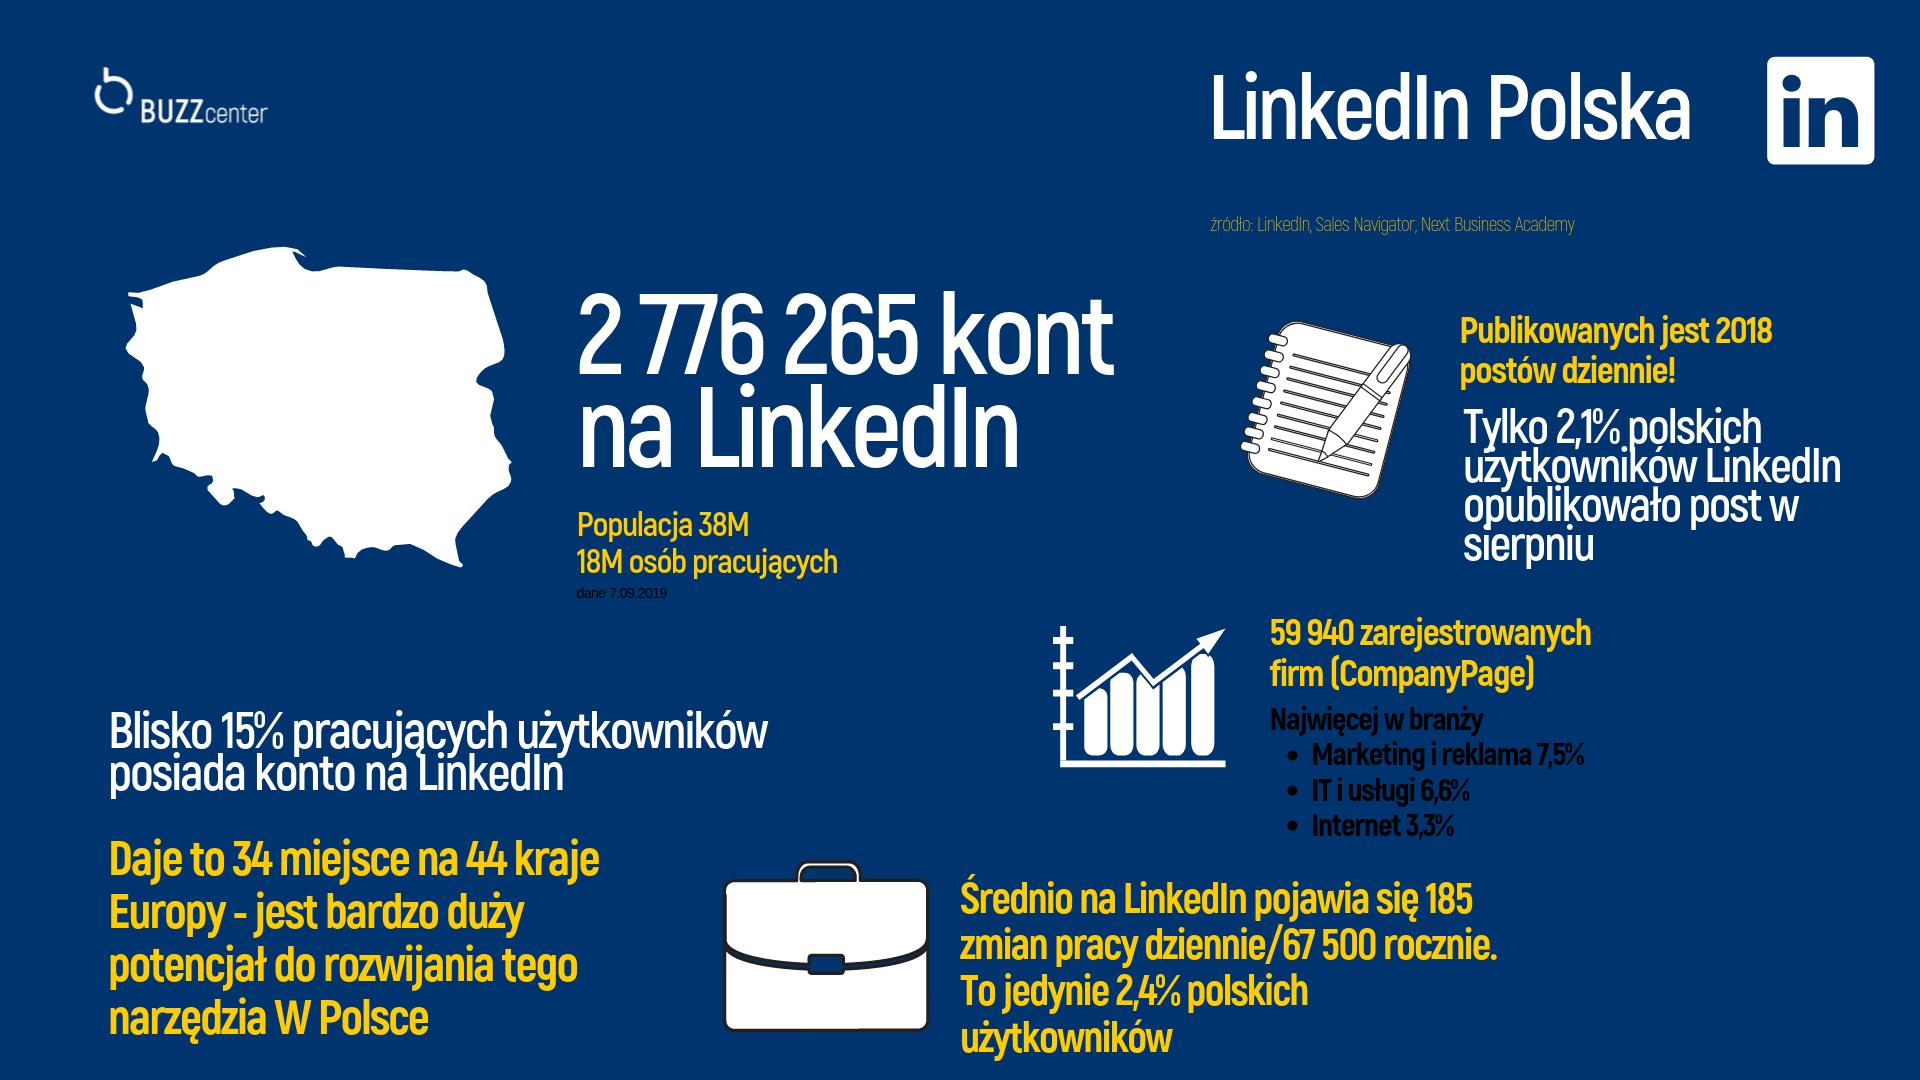 Moc LinkedIn - Polska